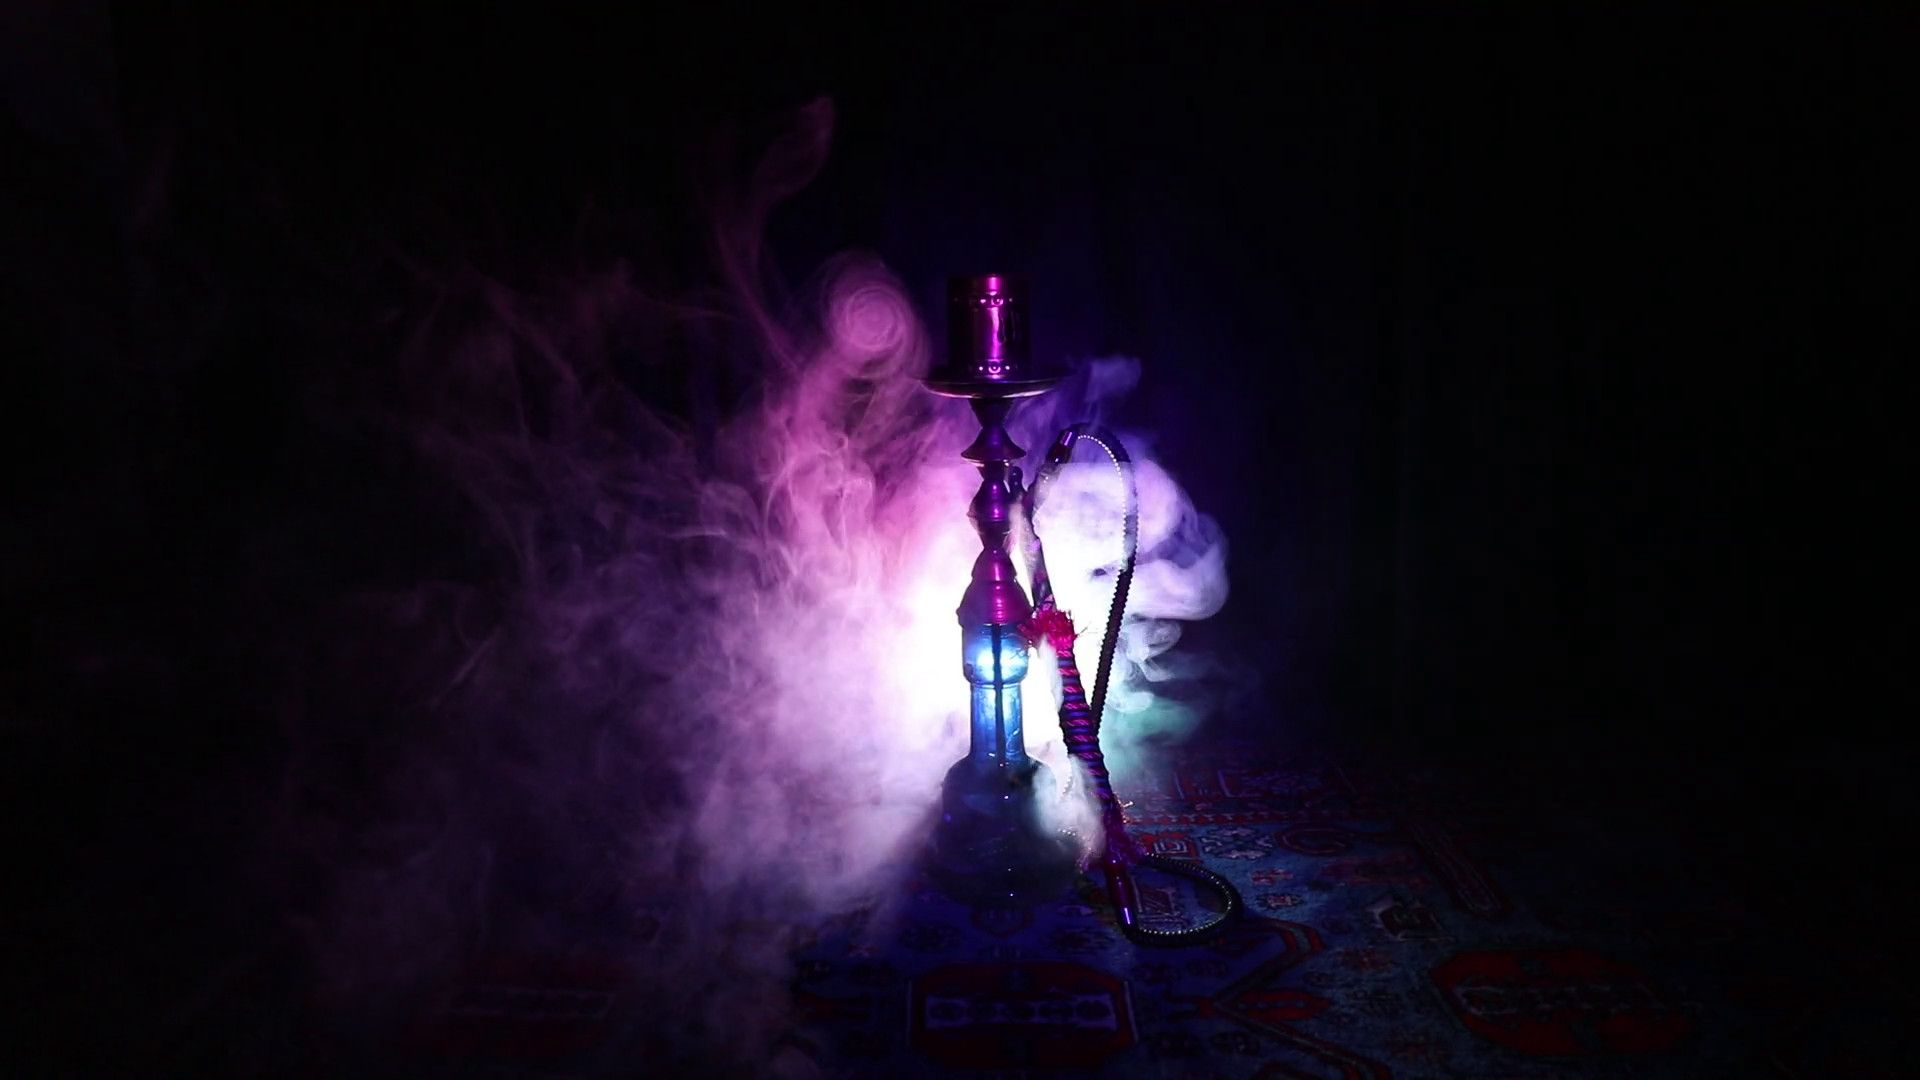 Shisha Wallpapers Top Free Shisha Backgrounds Wallpaperaccess